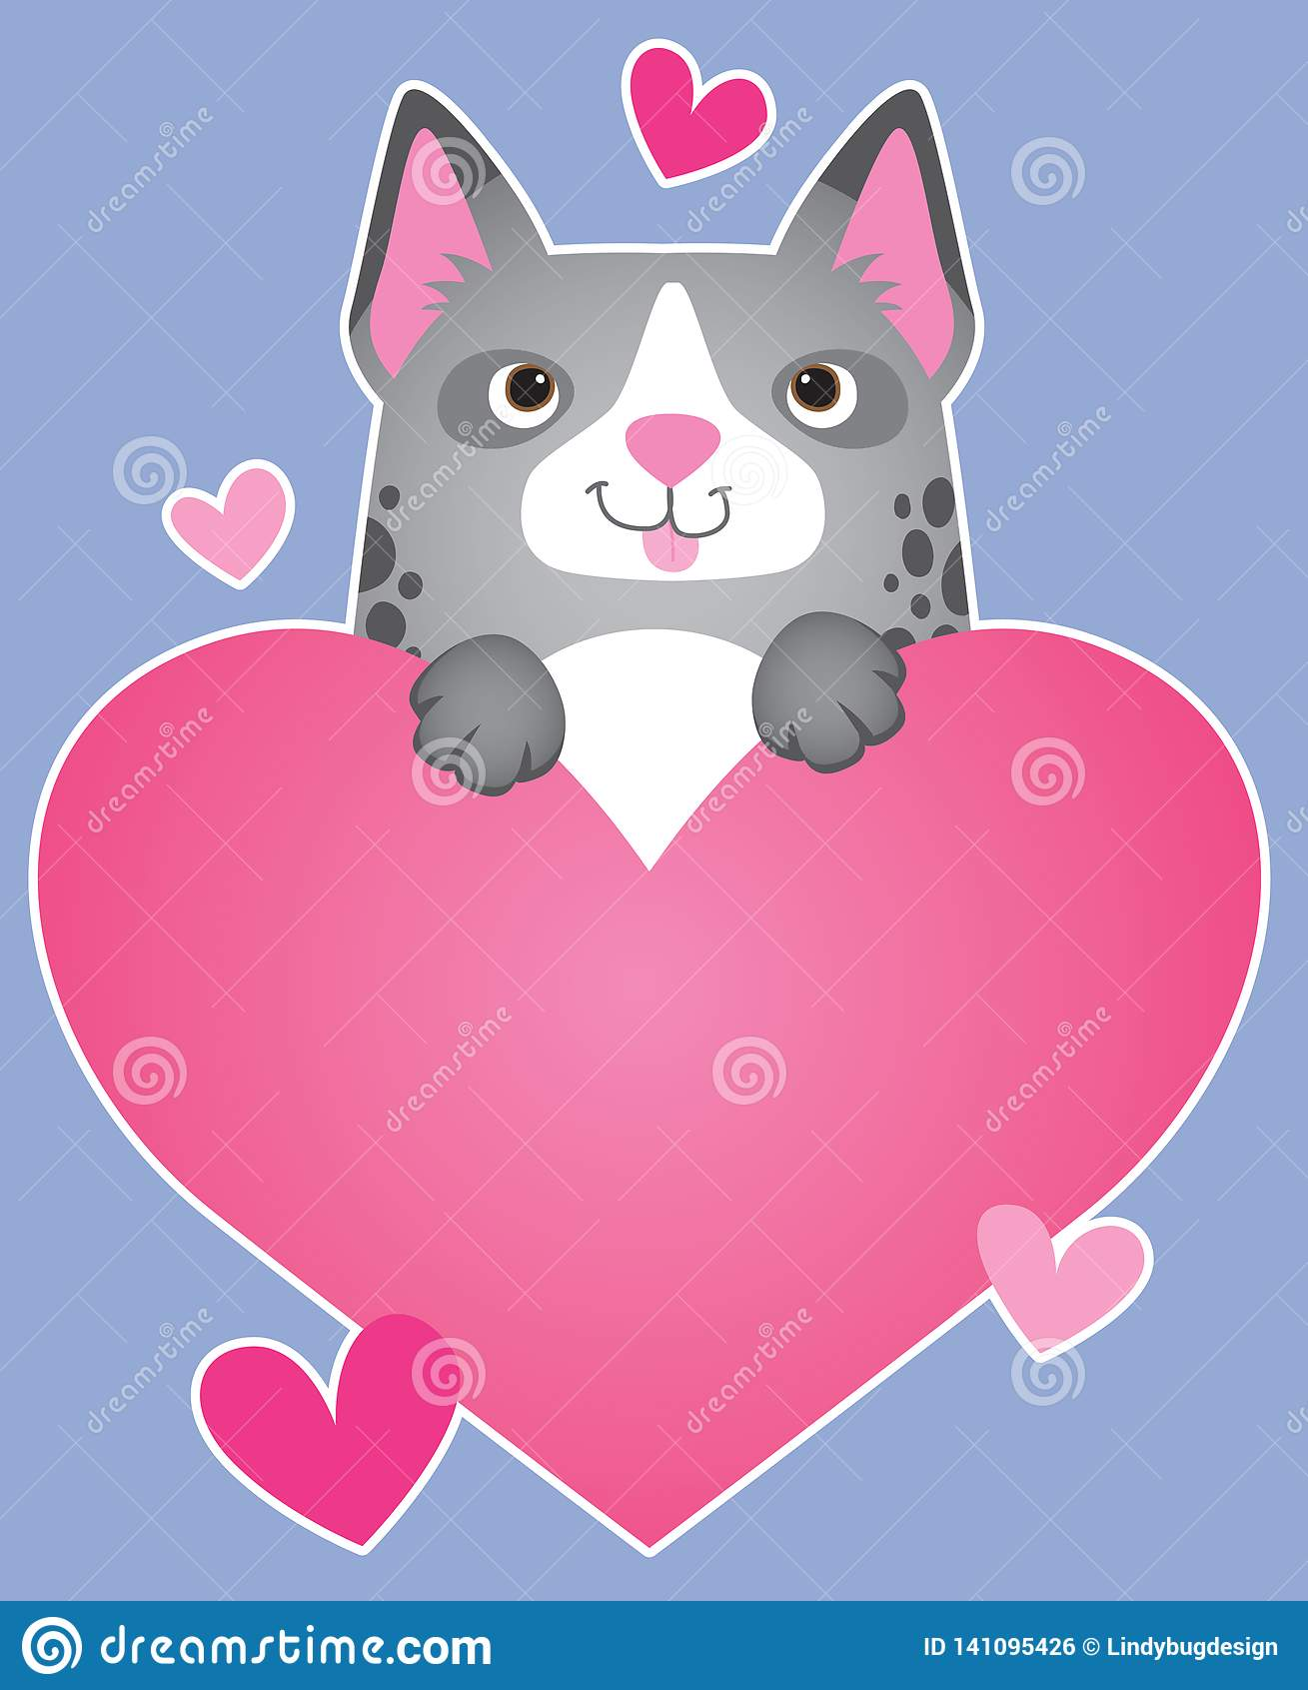 A Cartoon Dog Holding A Heart Stock Illustration ...